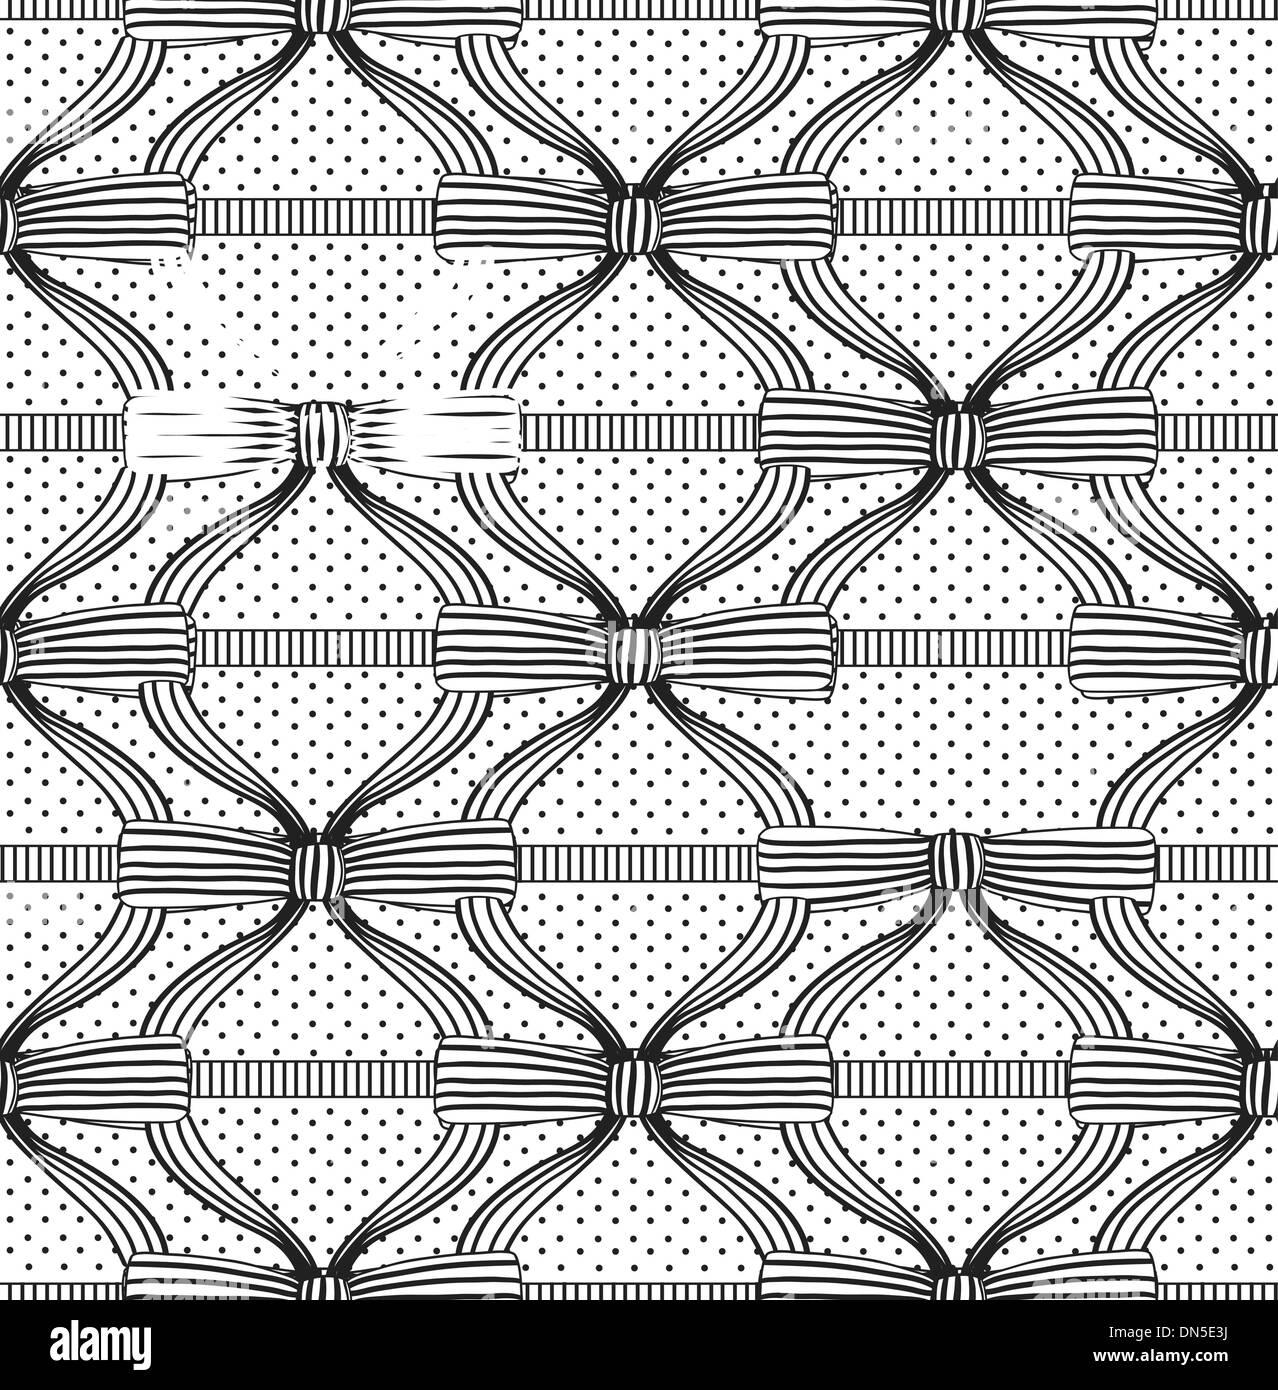 Fabric Bows Imágenes De Stock & Fabric Bows Fotos De Stock - Alamy